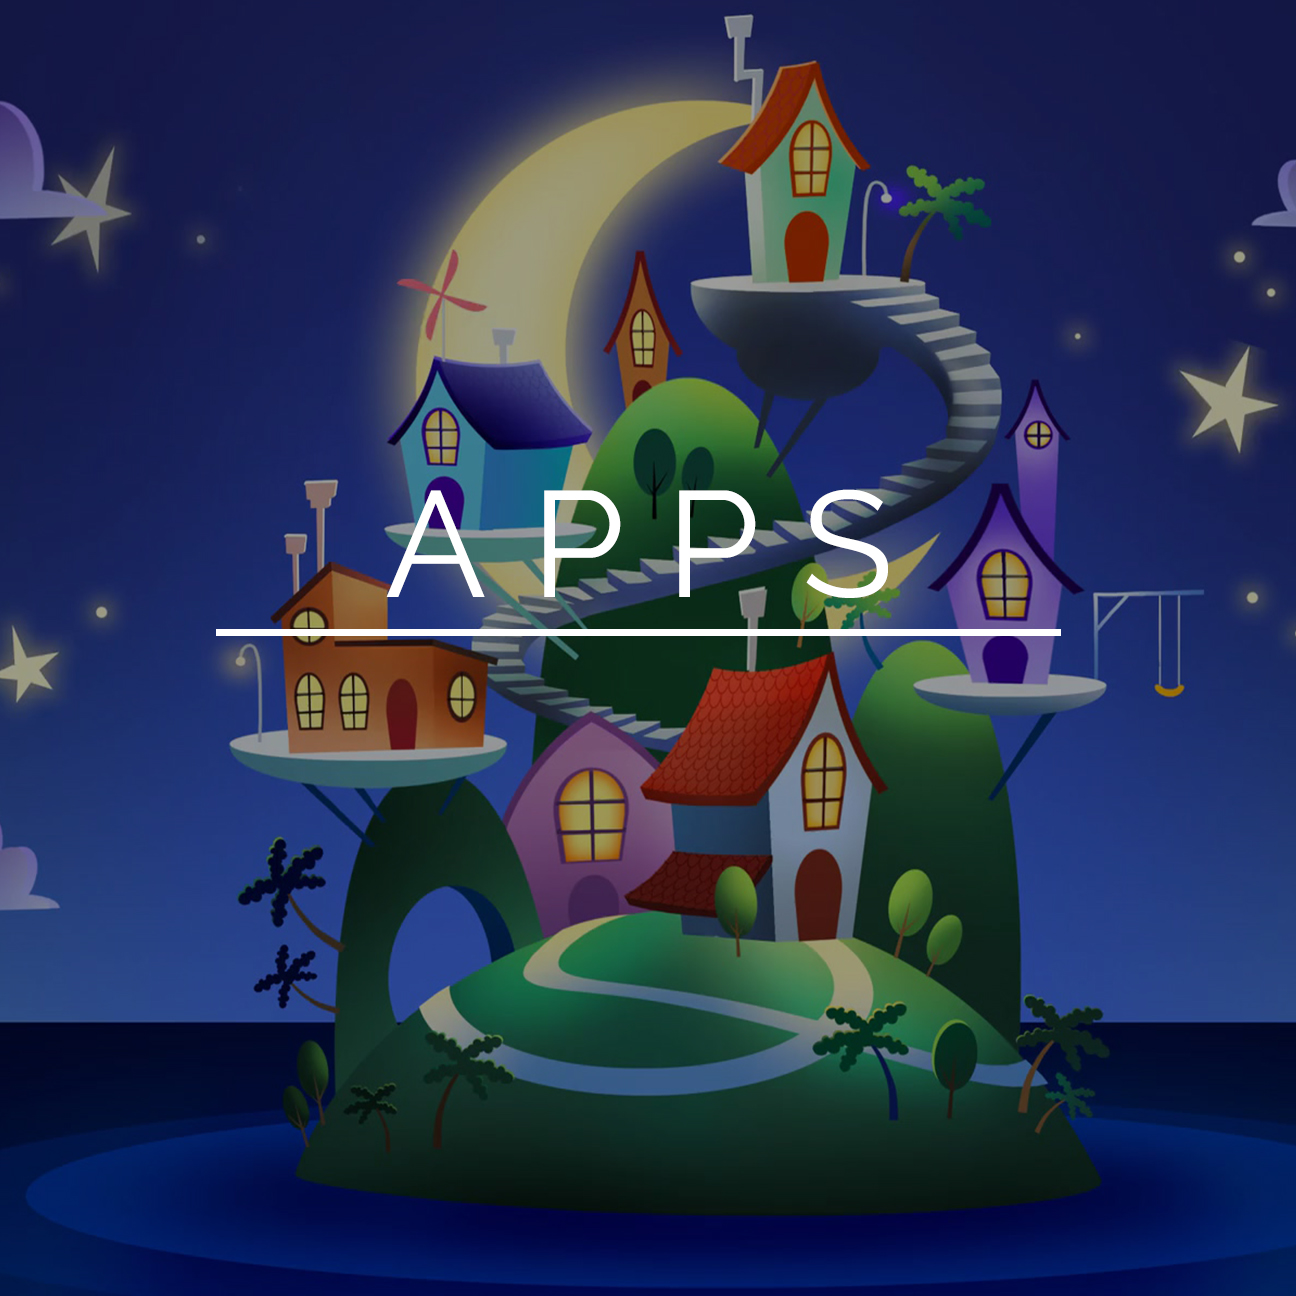 Apps_Thumb.jpg